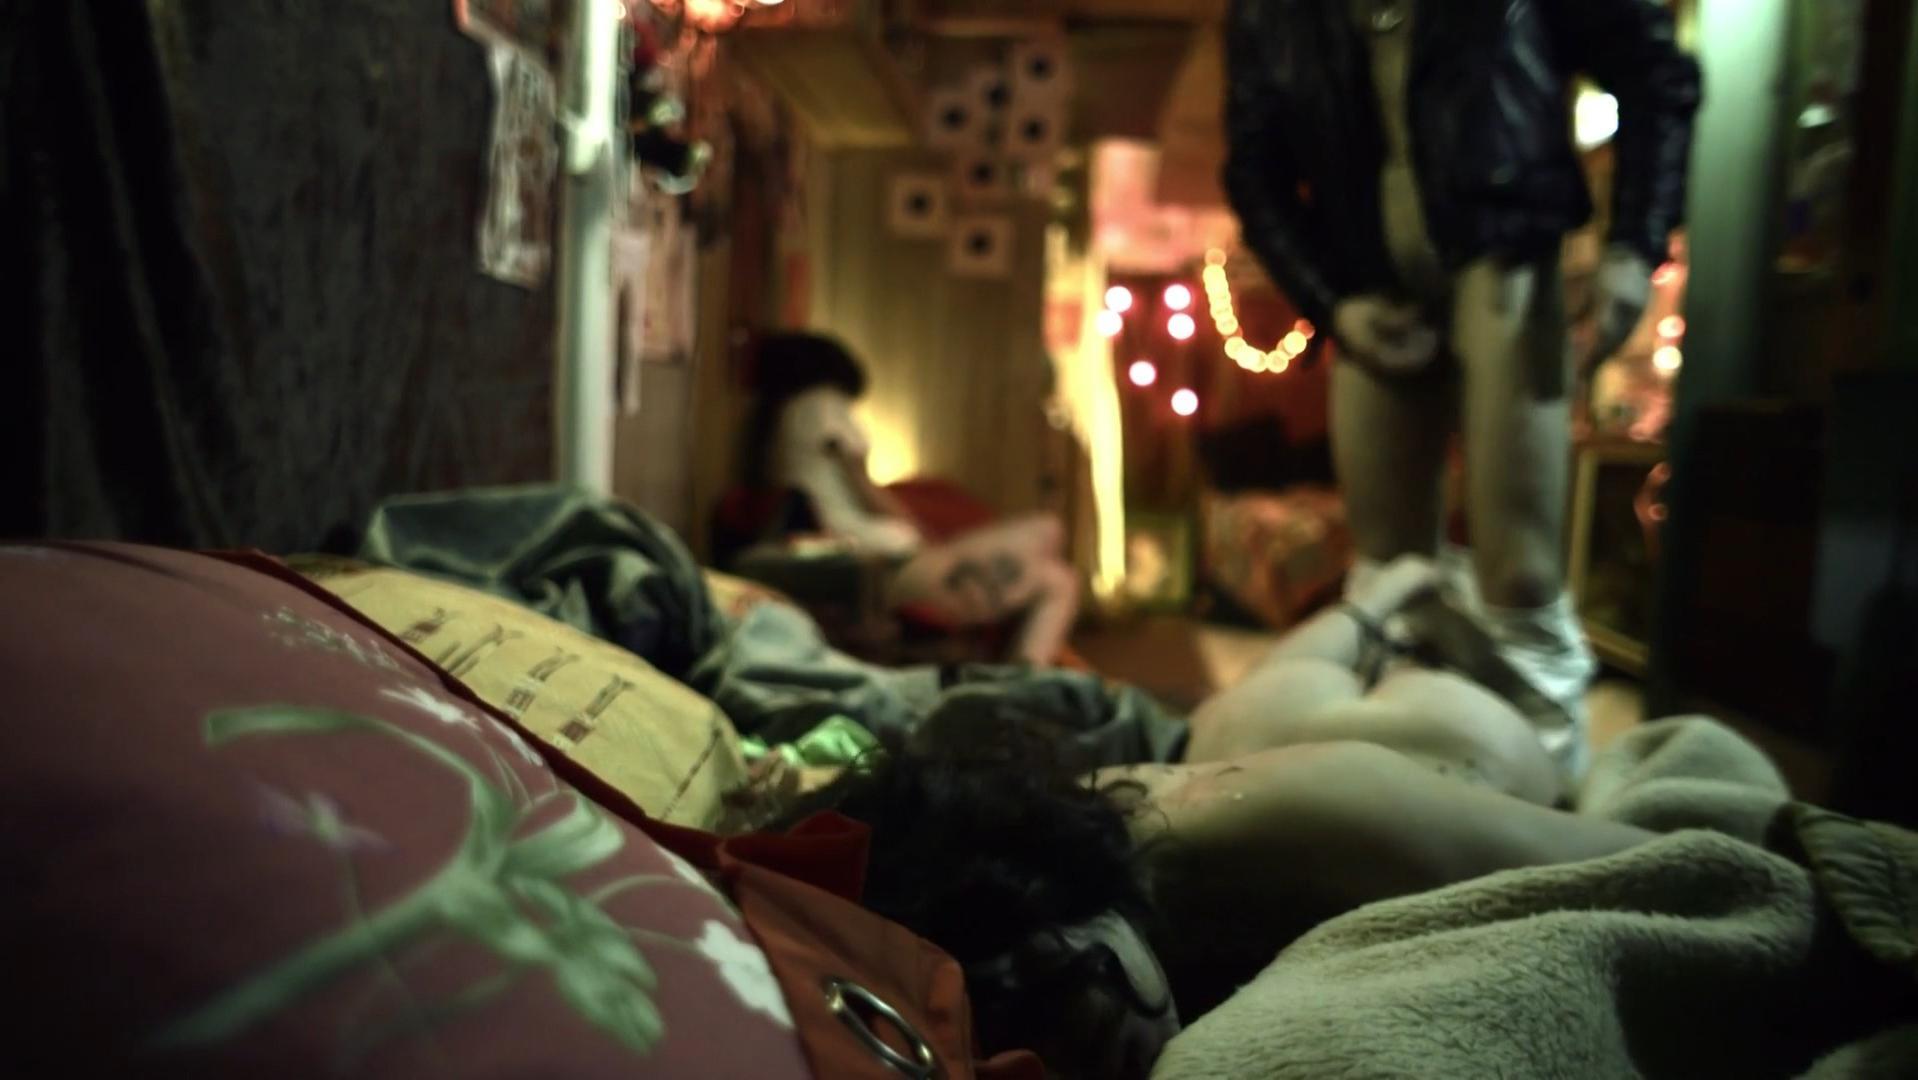 Daphne Hesnard nude - Nuit noire (2013)